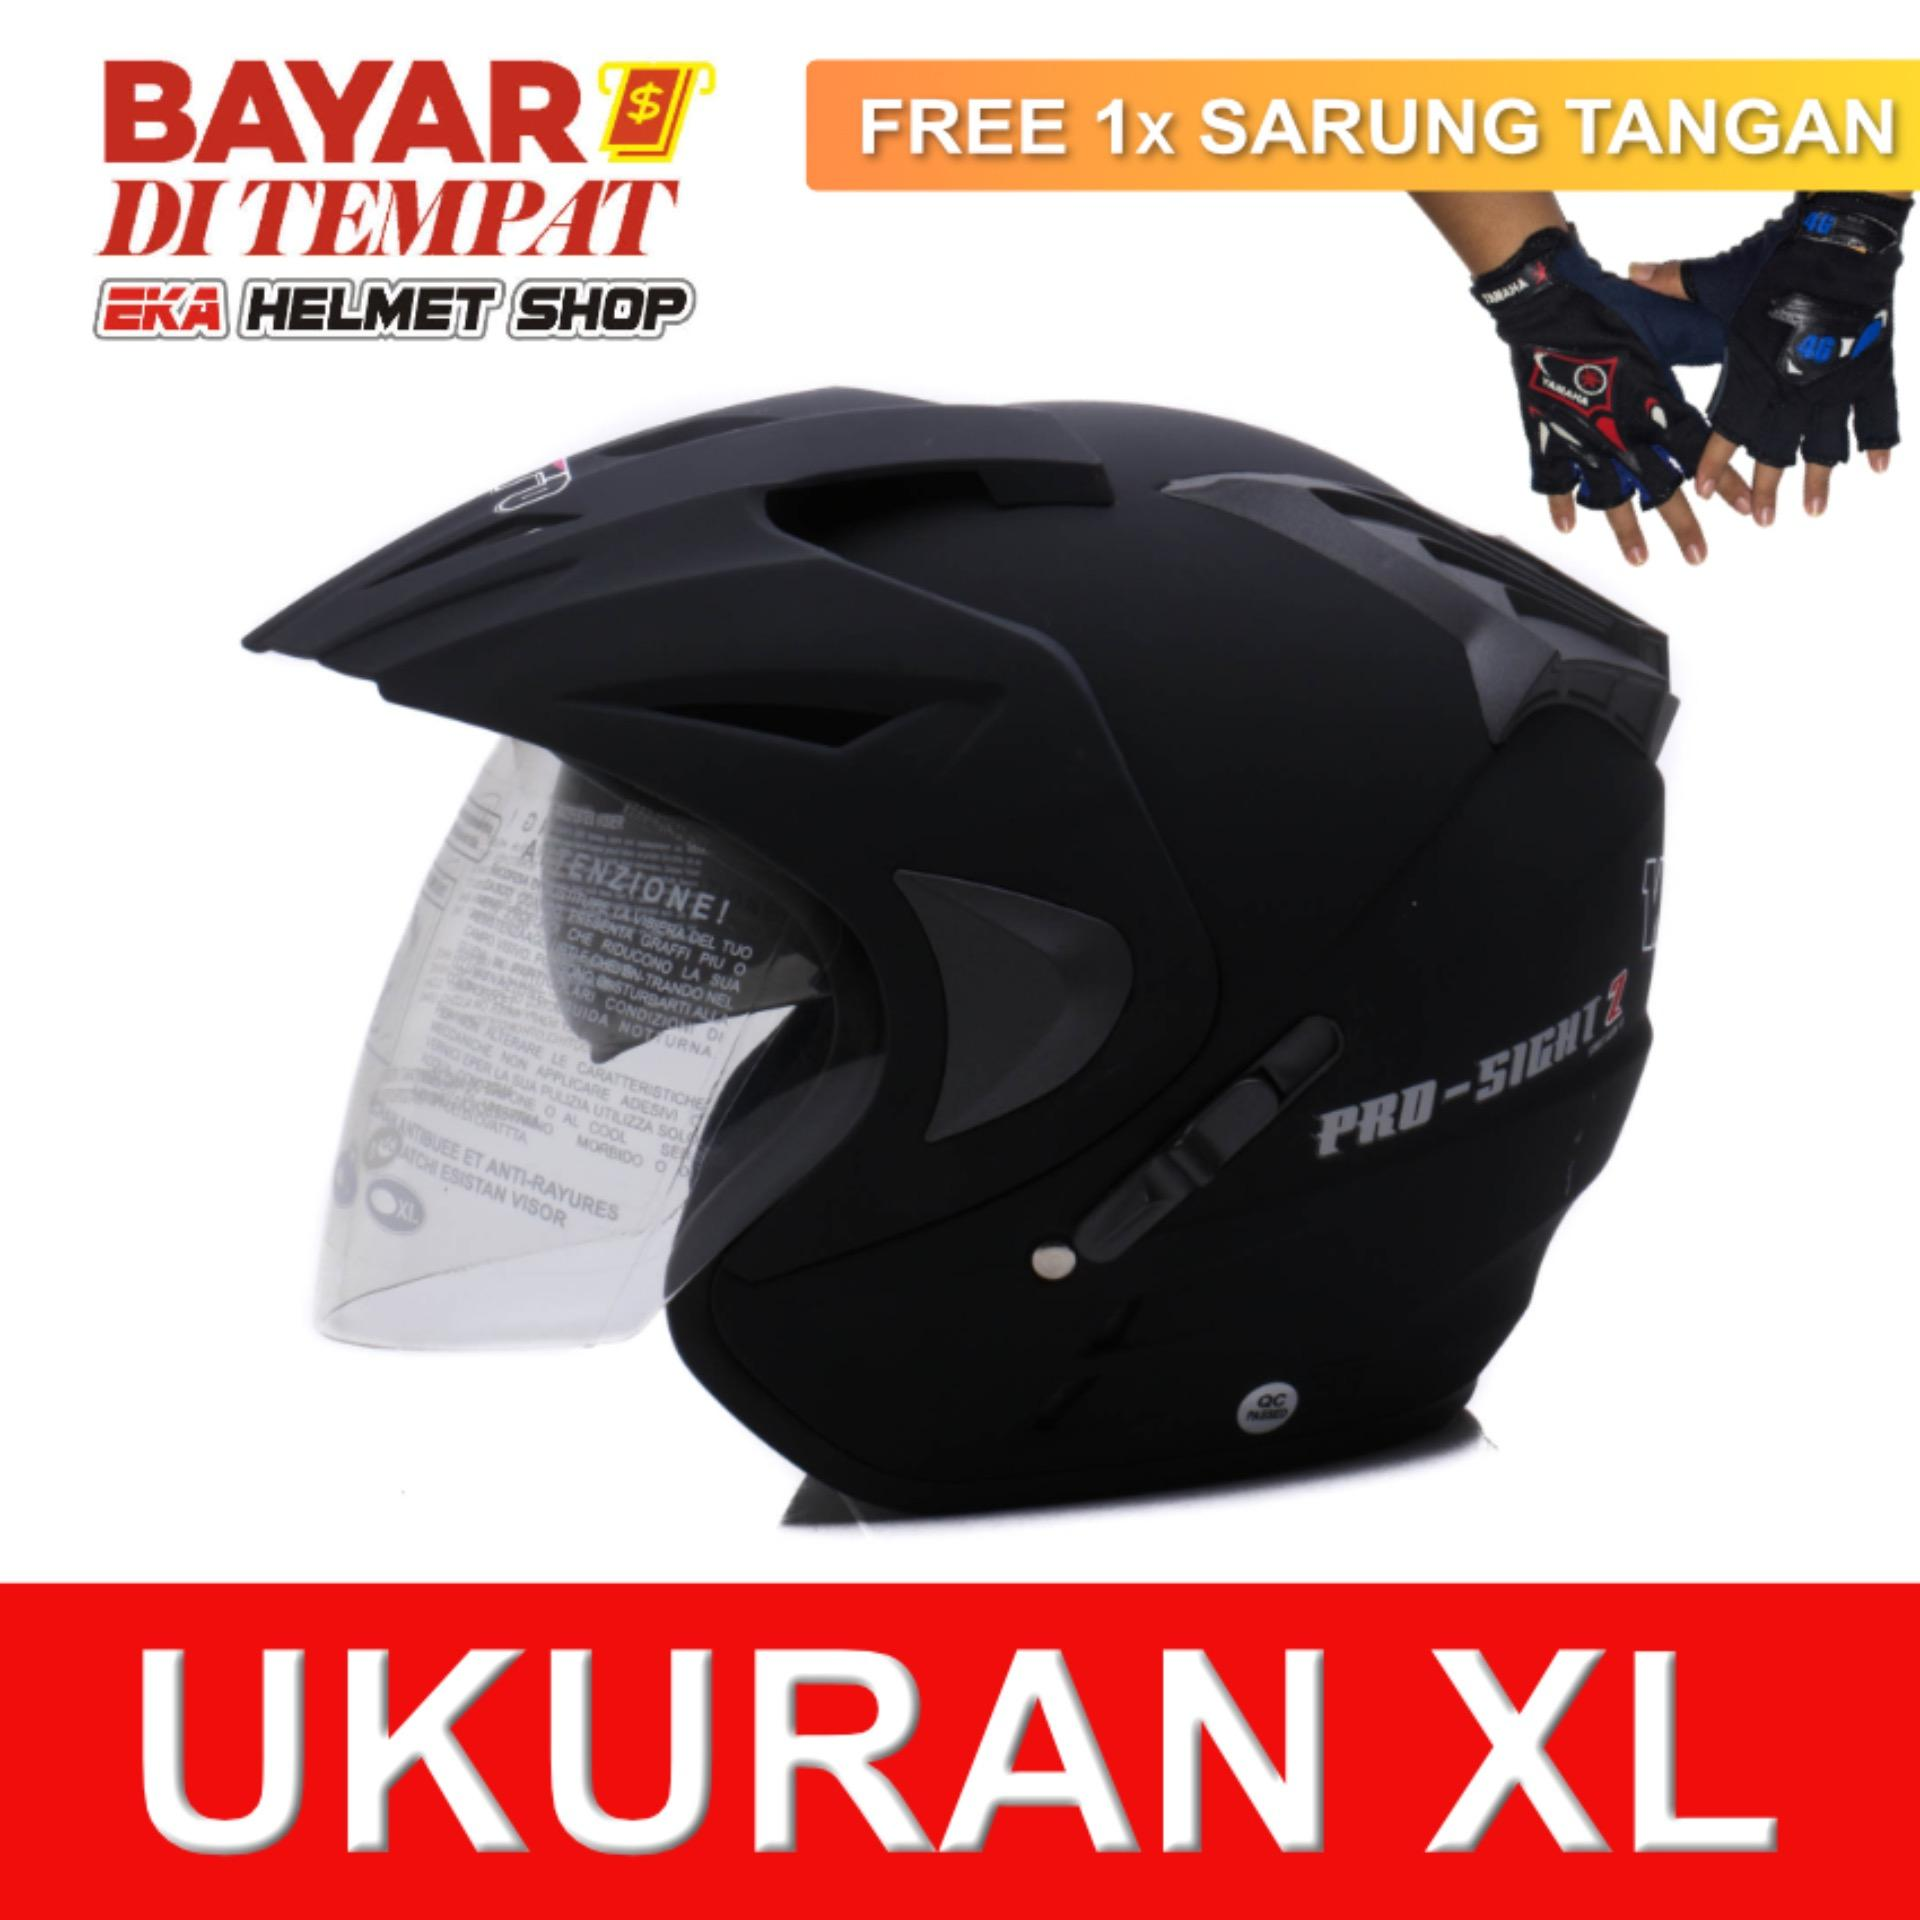 Toko Jual Wto Helmet Pro Sight Hitam Doff Promo Gratis Sarung Tangan